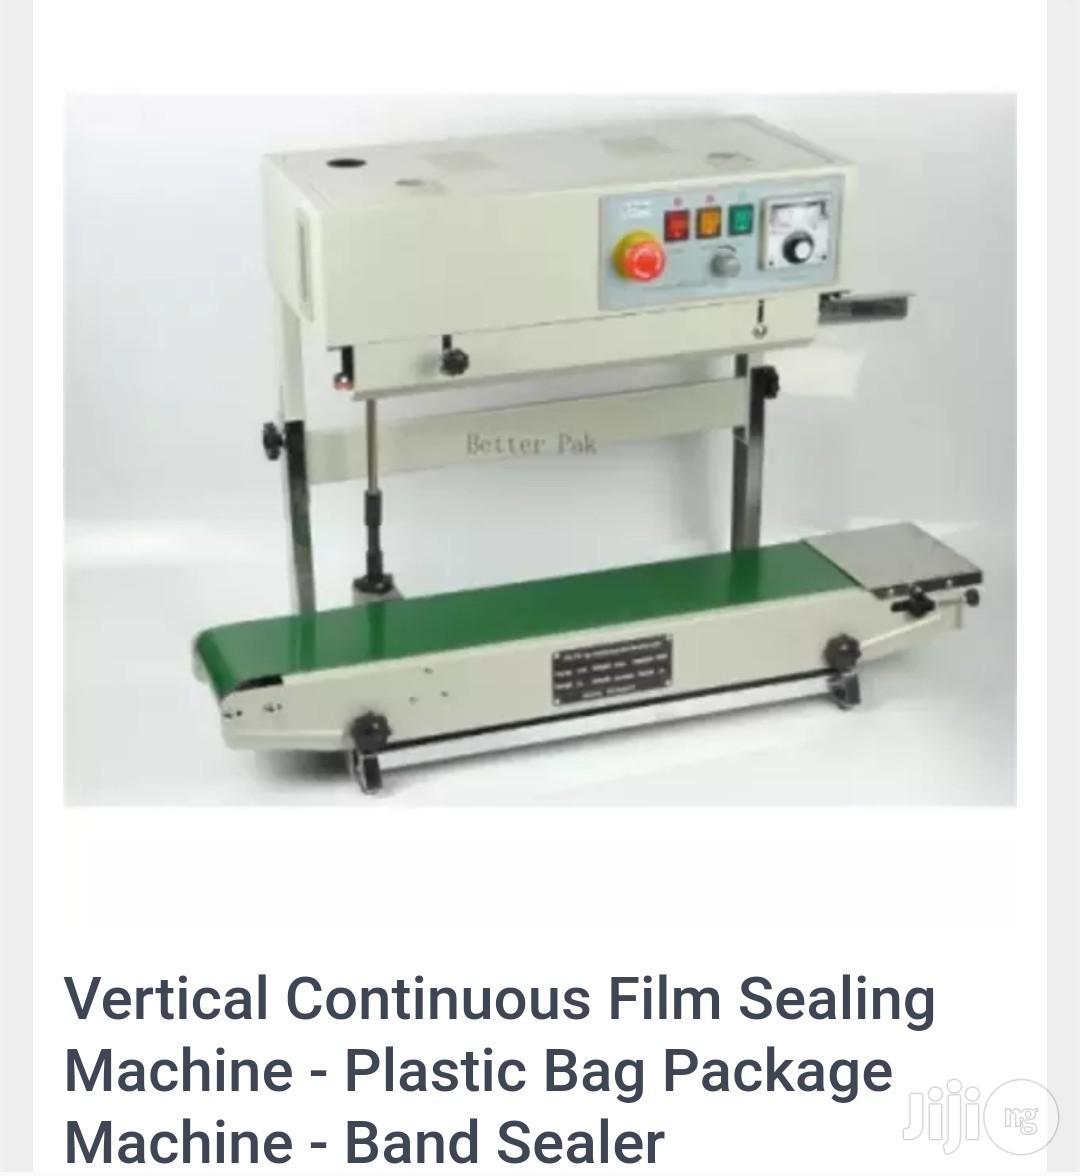 Vertical Continuous Film Sealing Machine Plastic Bag Package Sealer